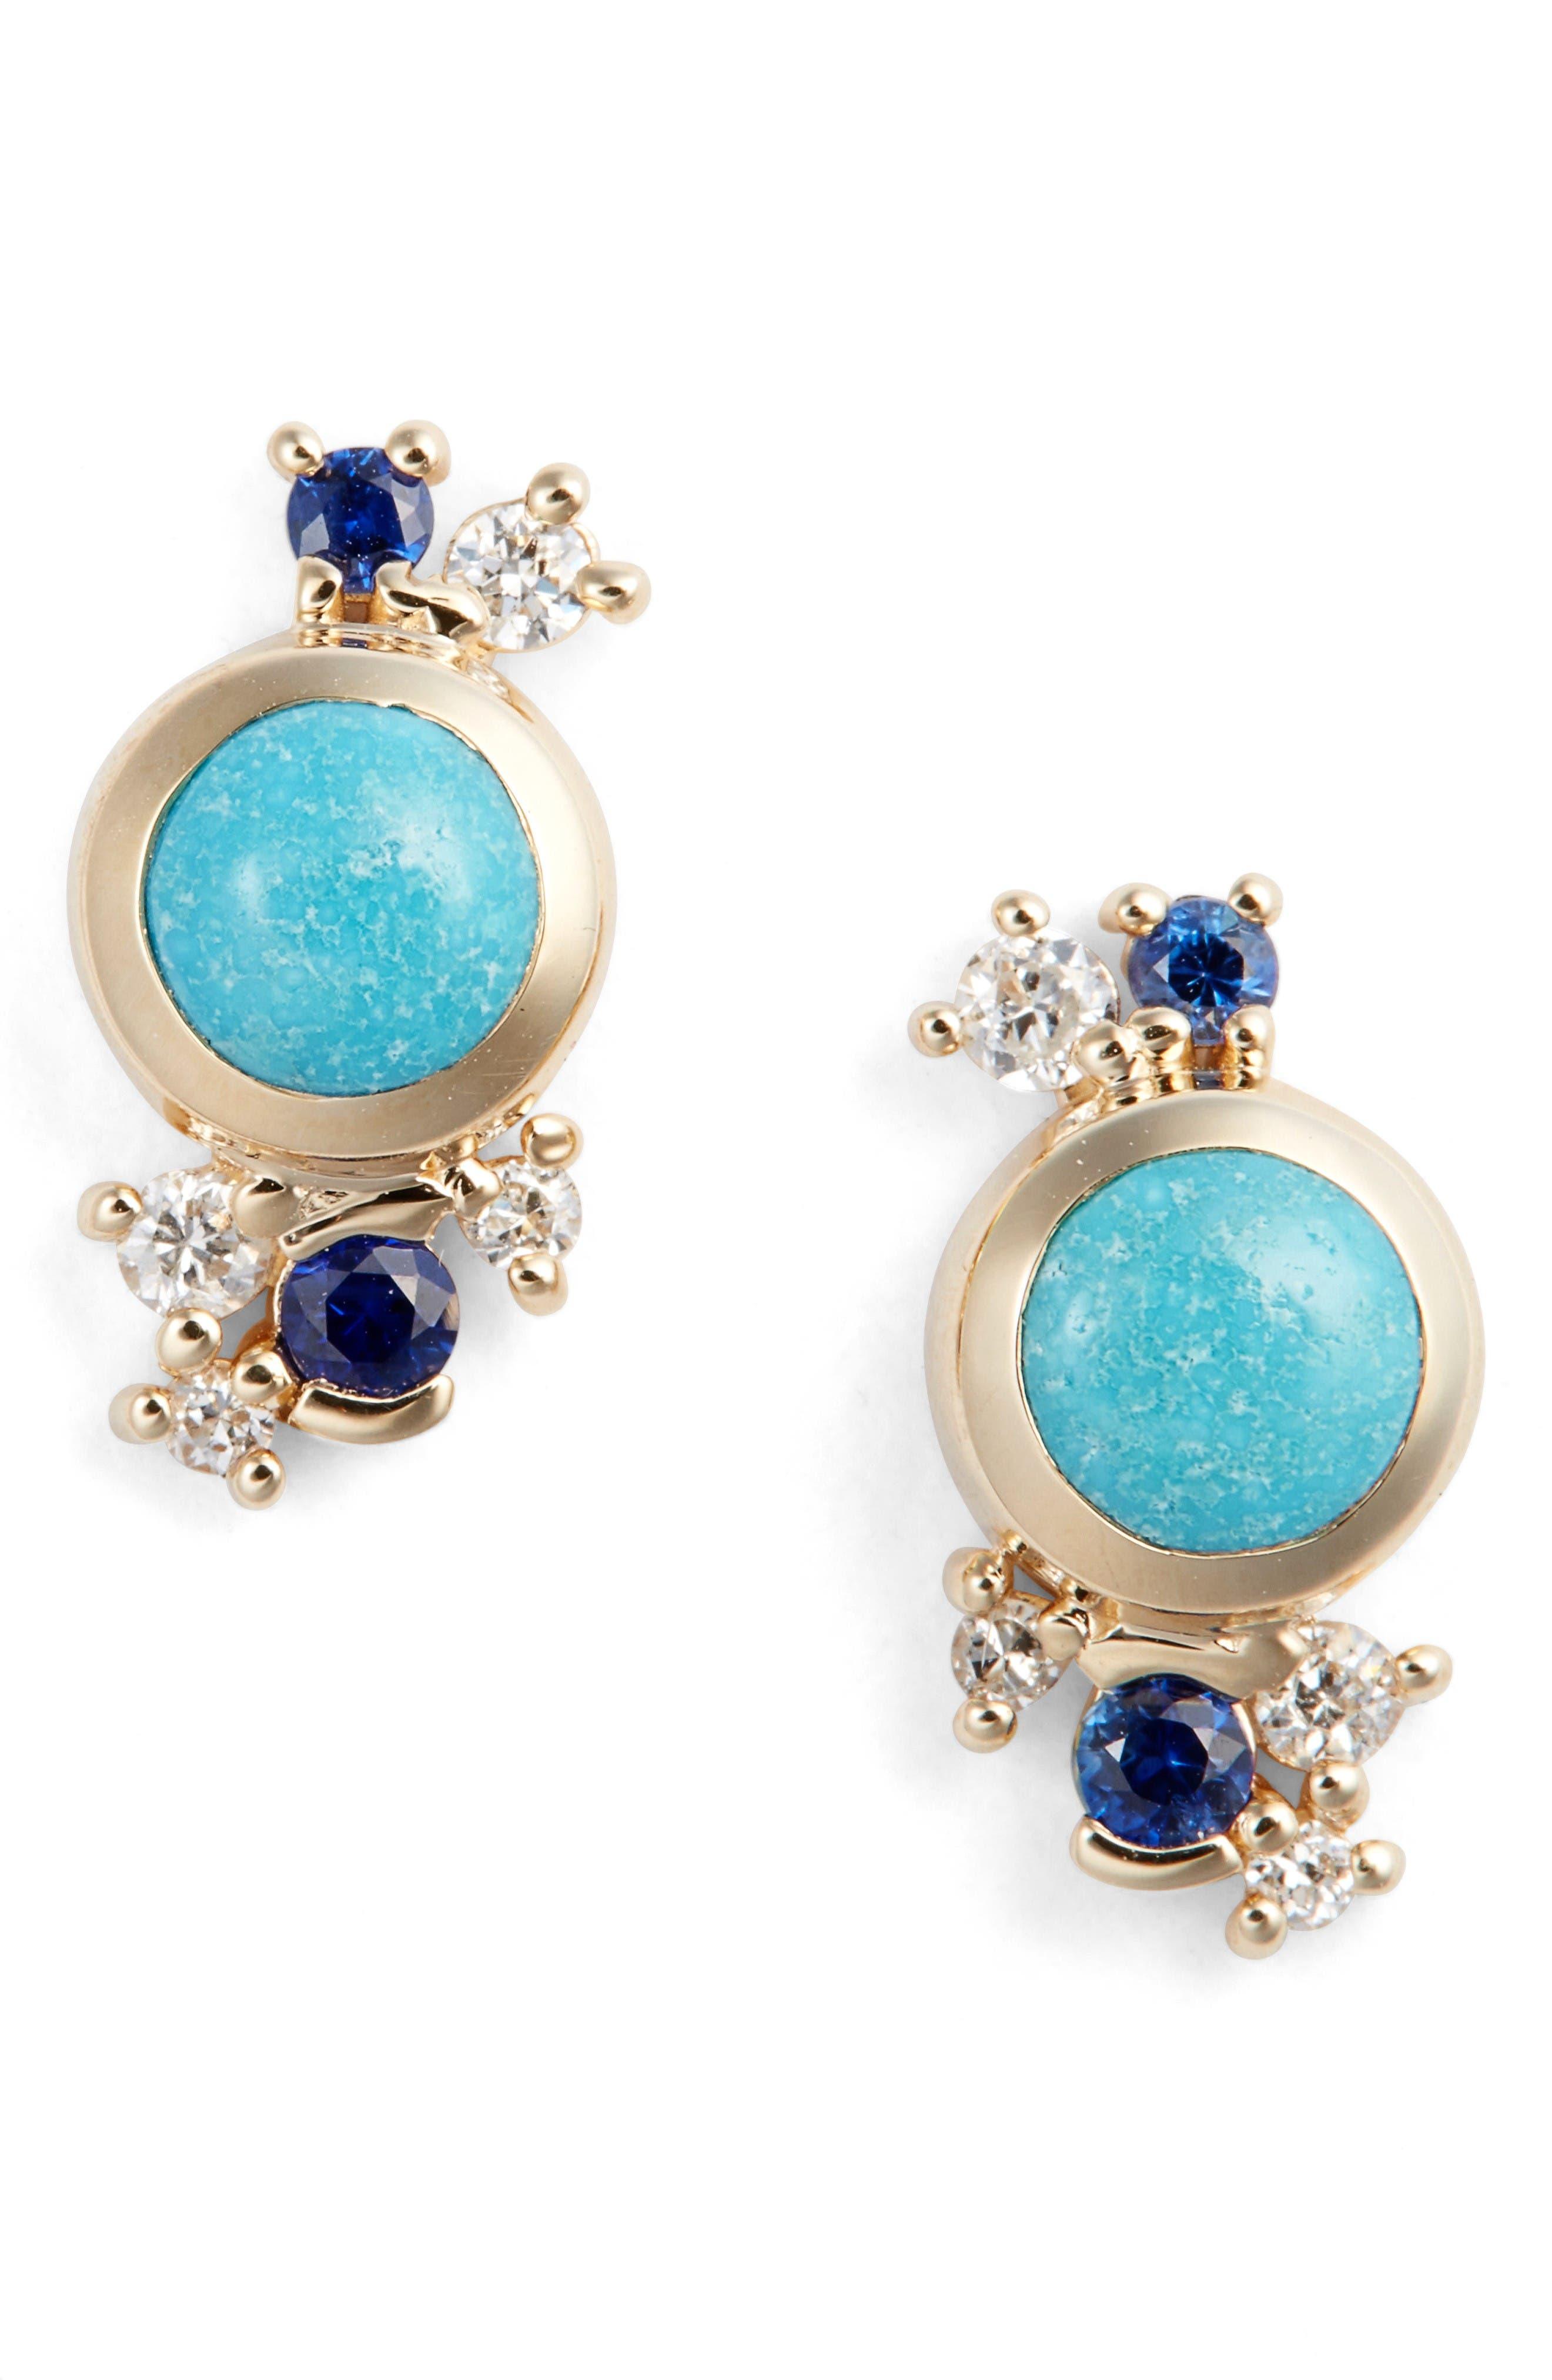 MOCIUN Turquoise, Sapphire & Diamond Earrings